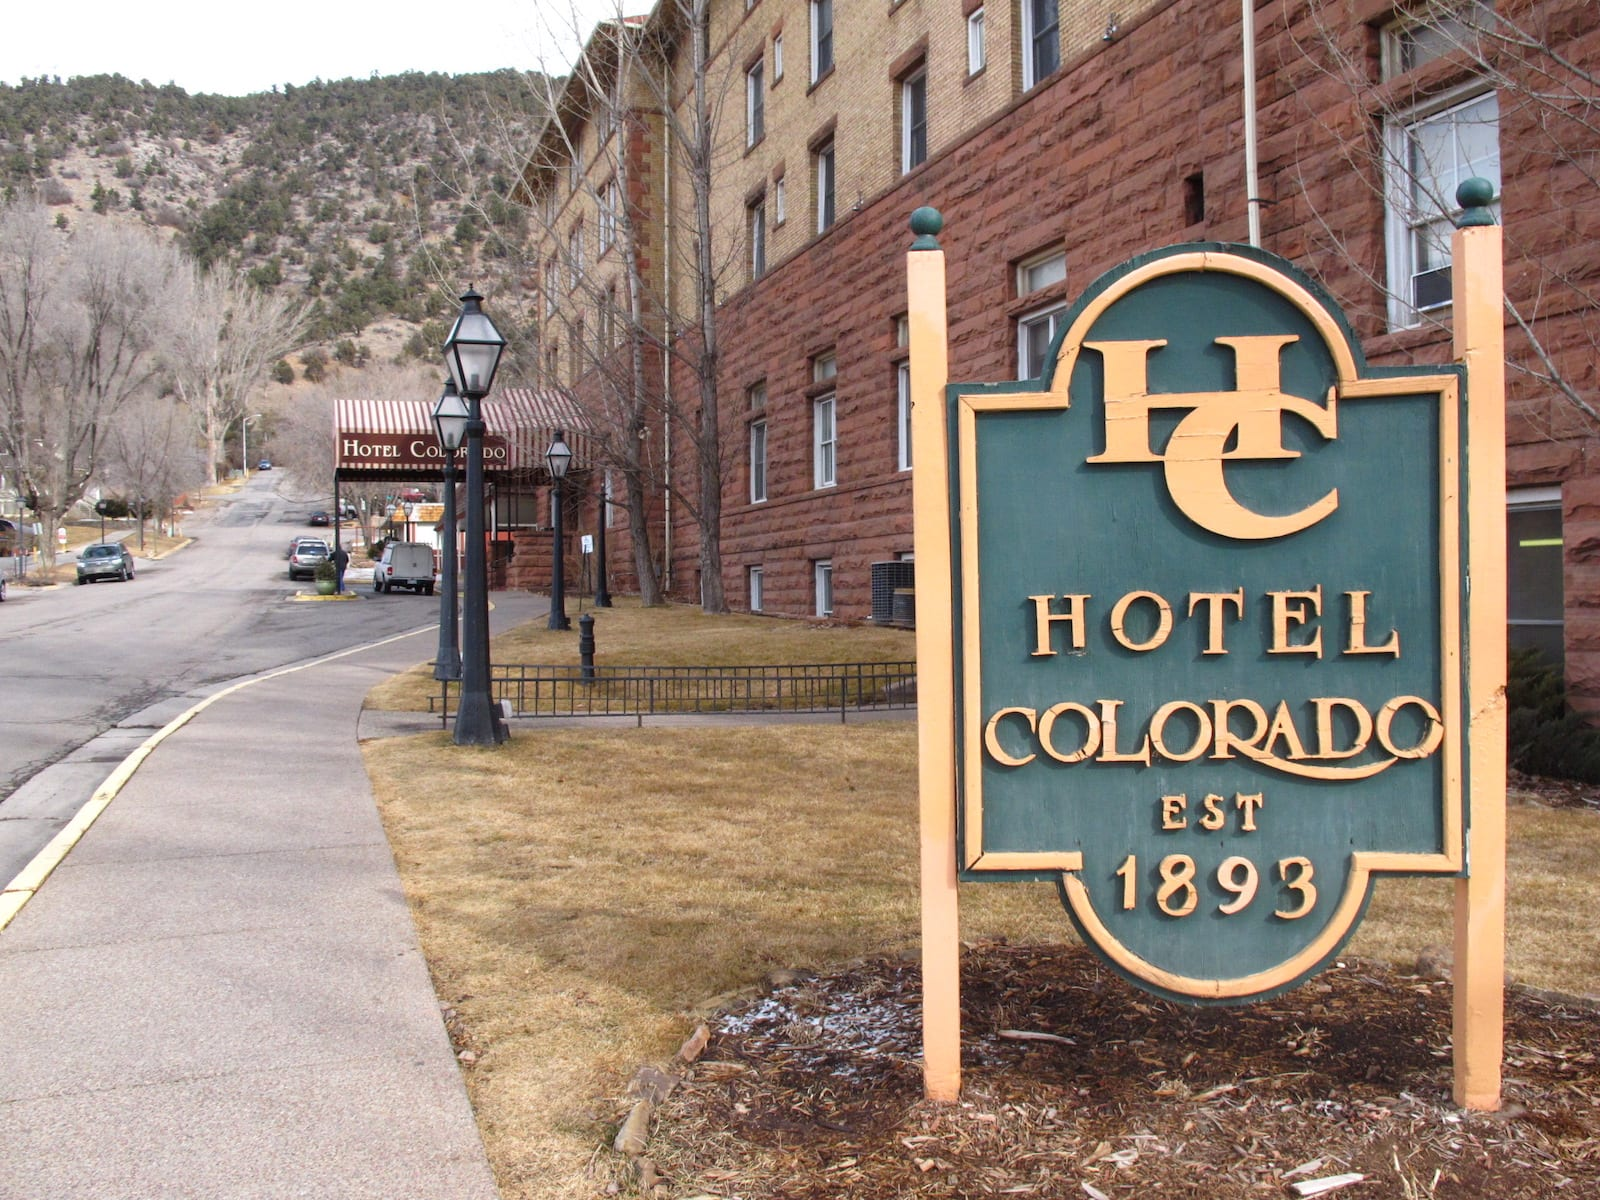 Hotel Colorado Glenwood Springs Sign